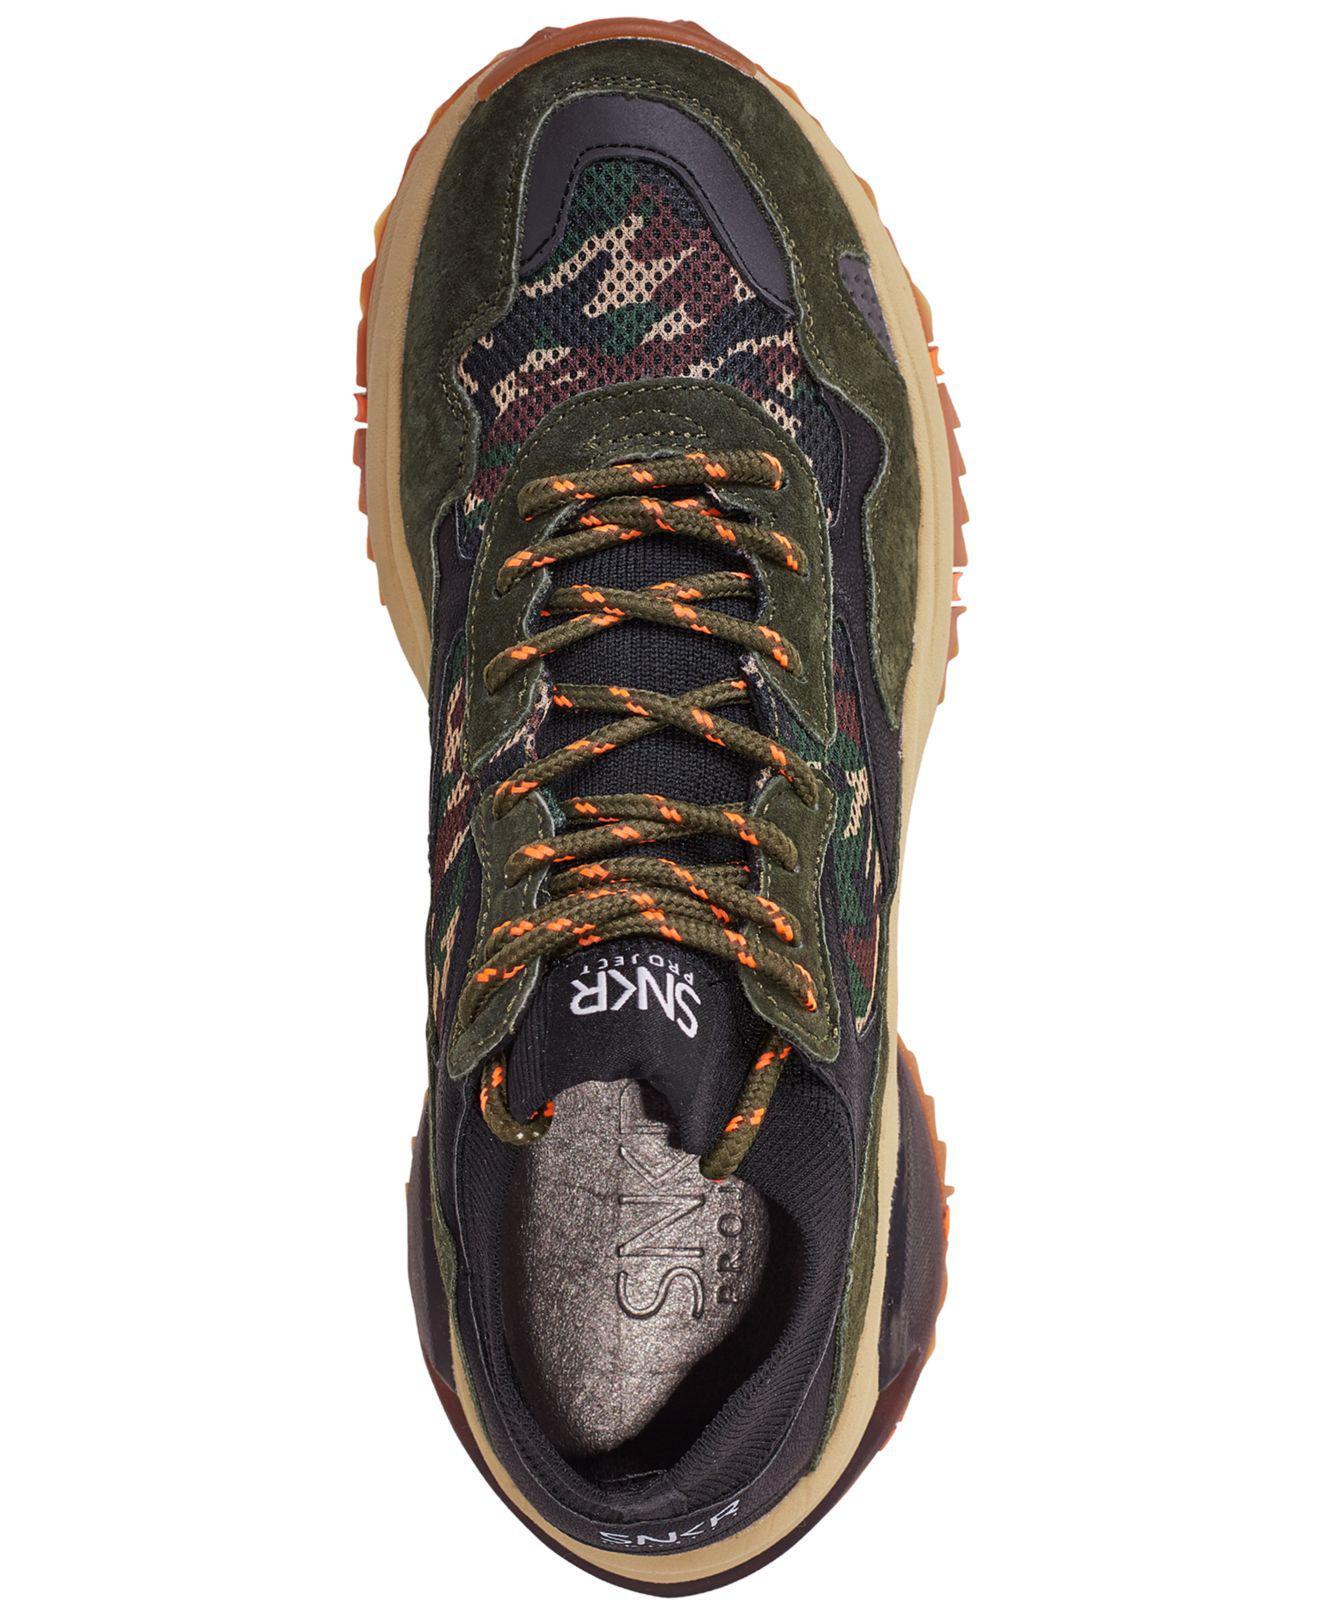 Suede Crosby Athletic Casual Sneakers